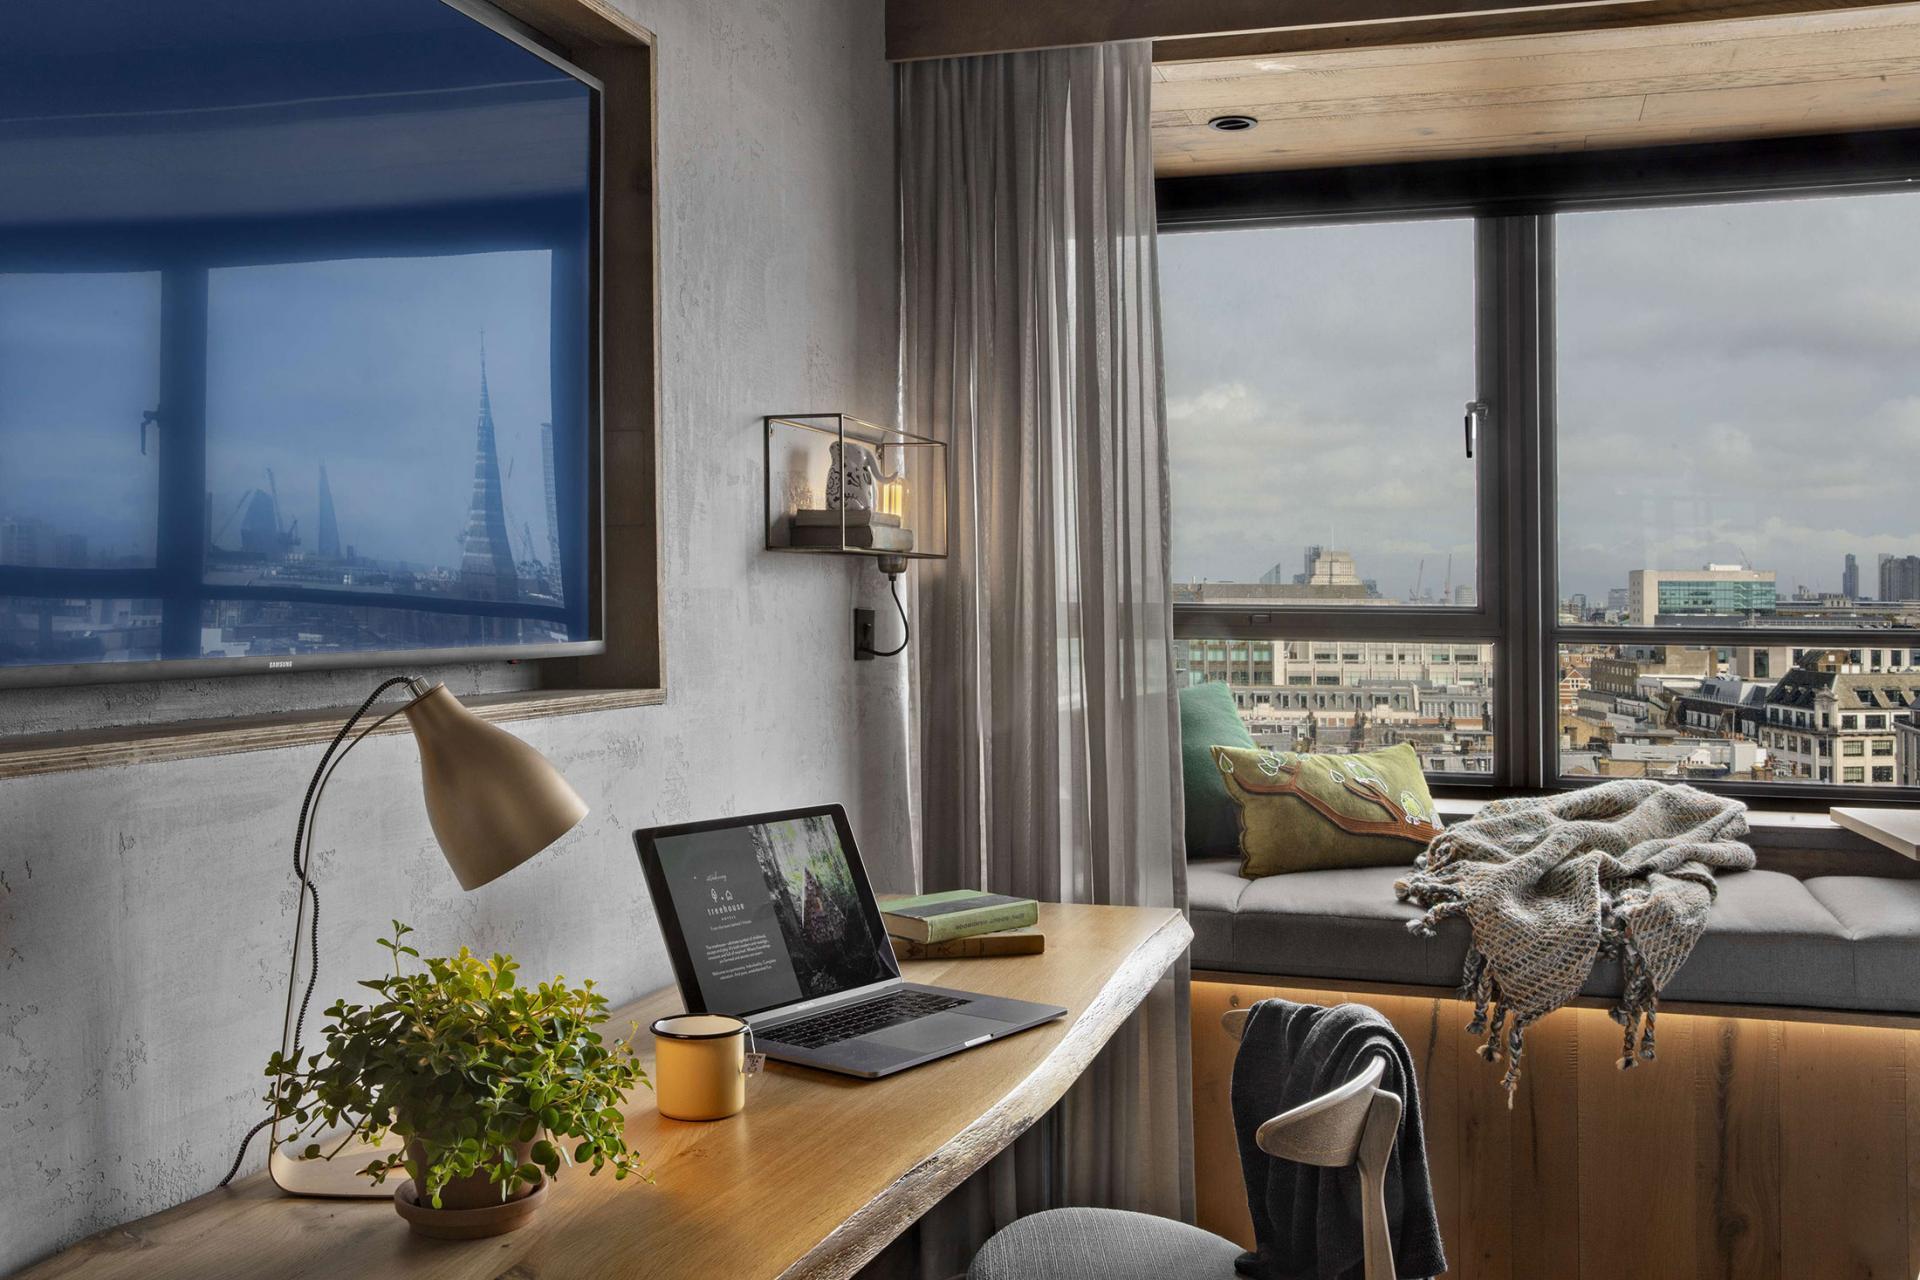 London Room Desk